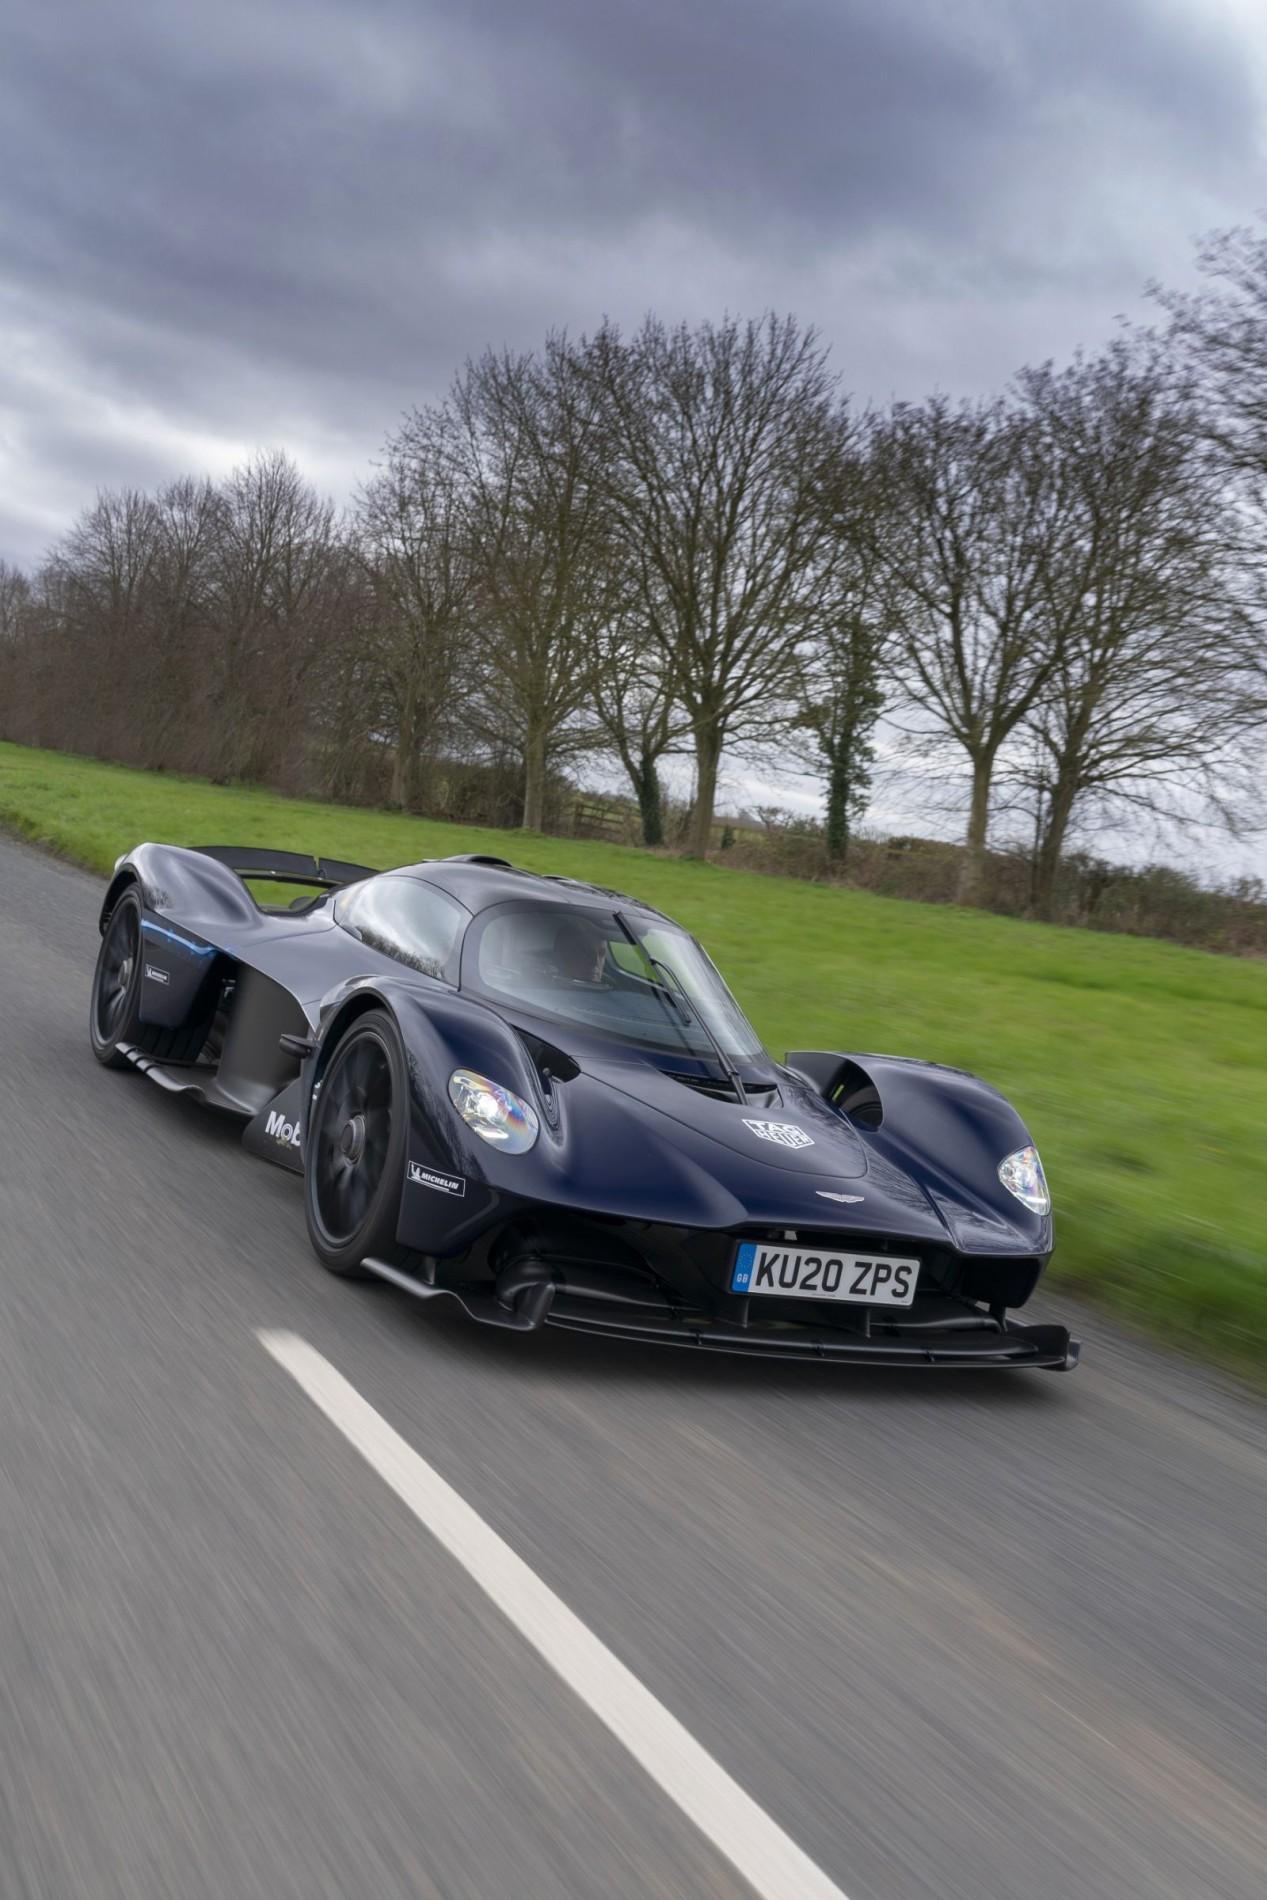 Aston Martin Valkyrie - Aston Martin Valkyrie